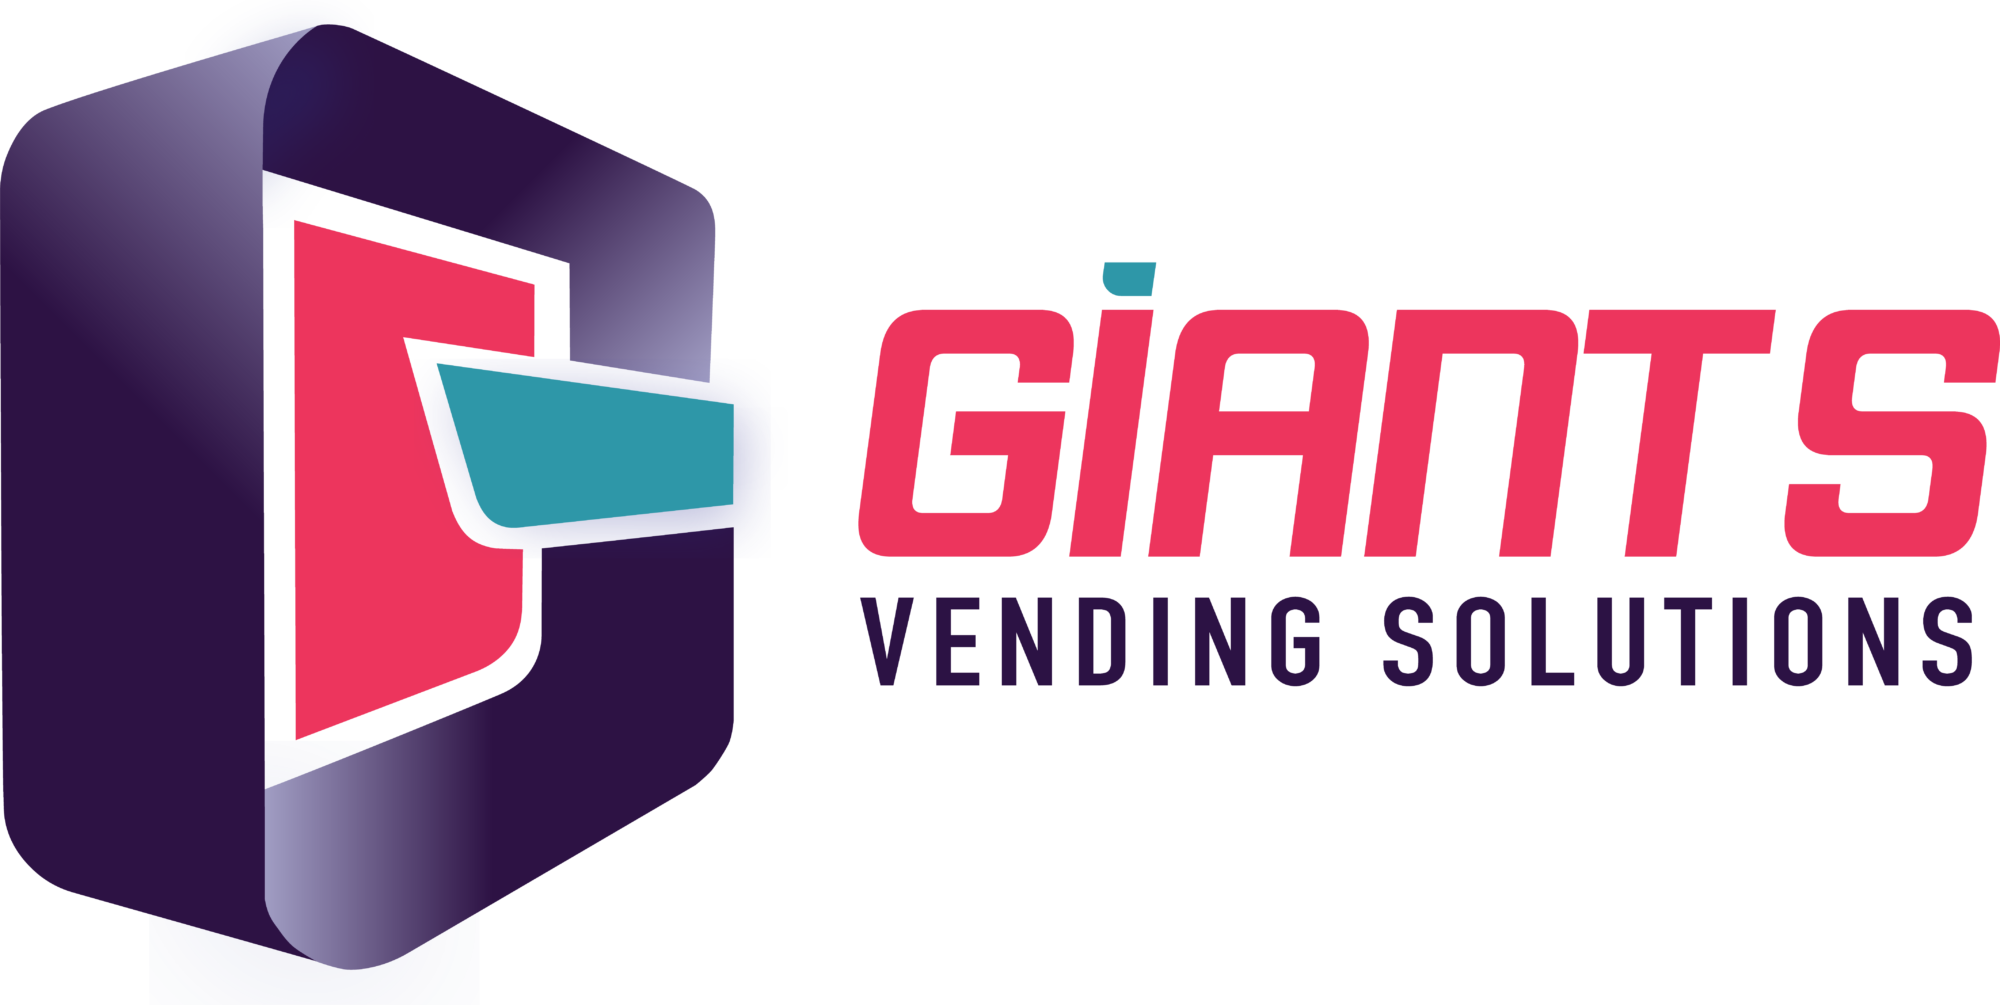 Giants Vending Solutions